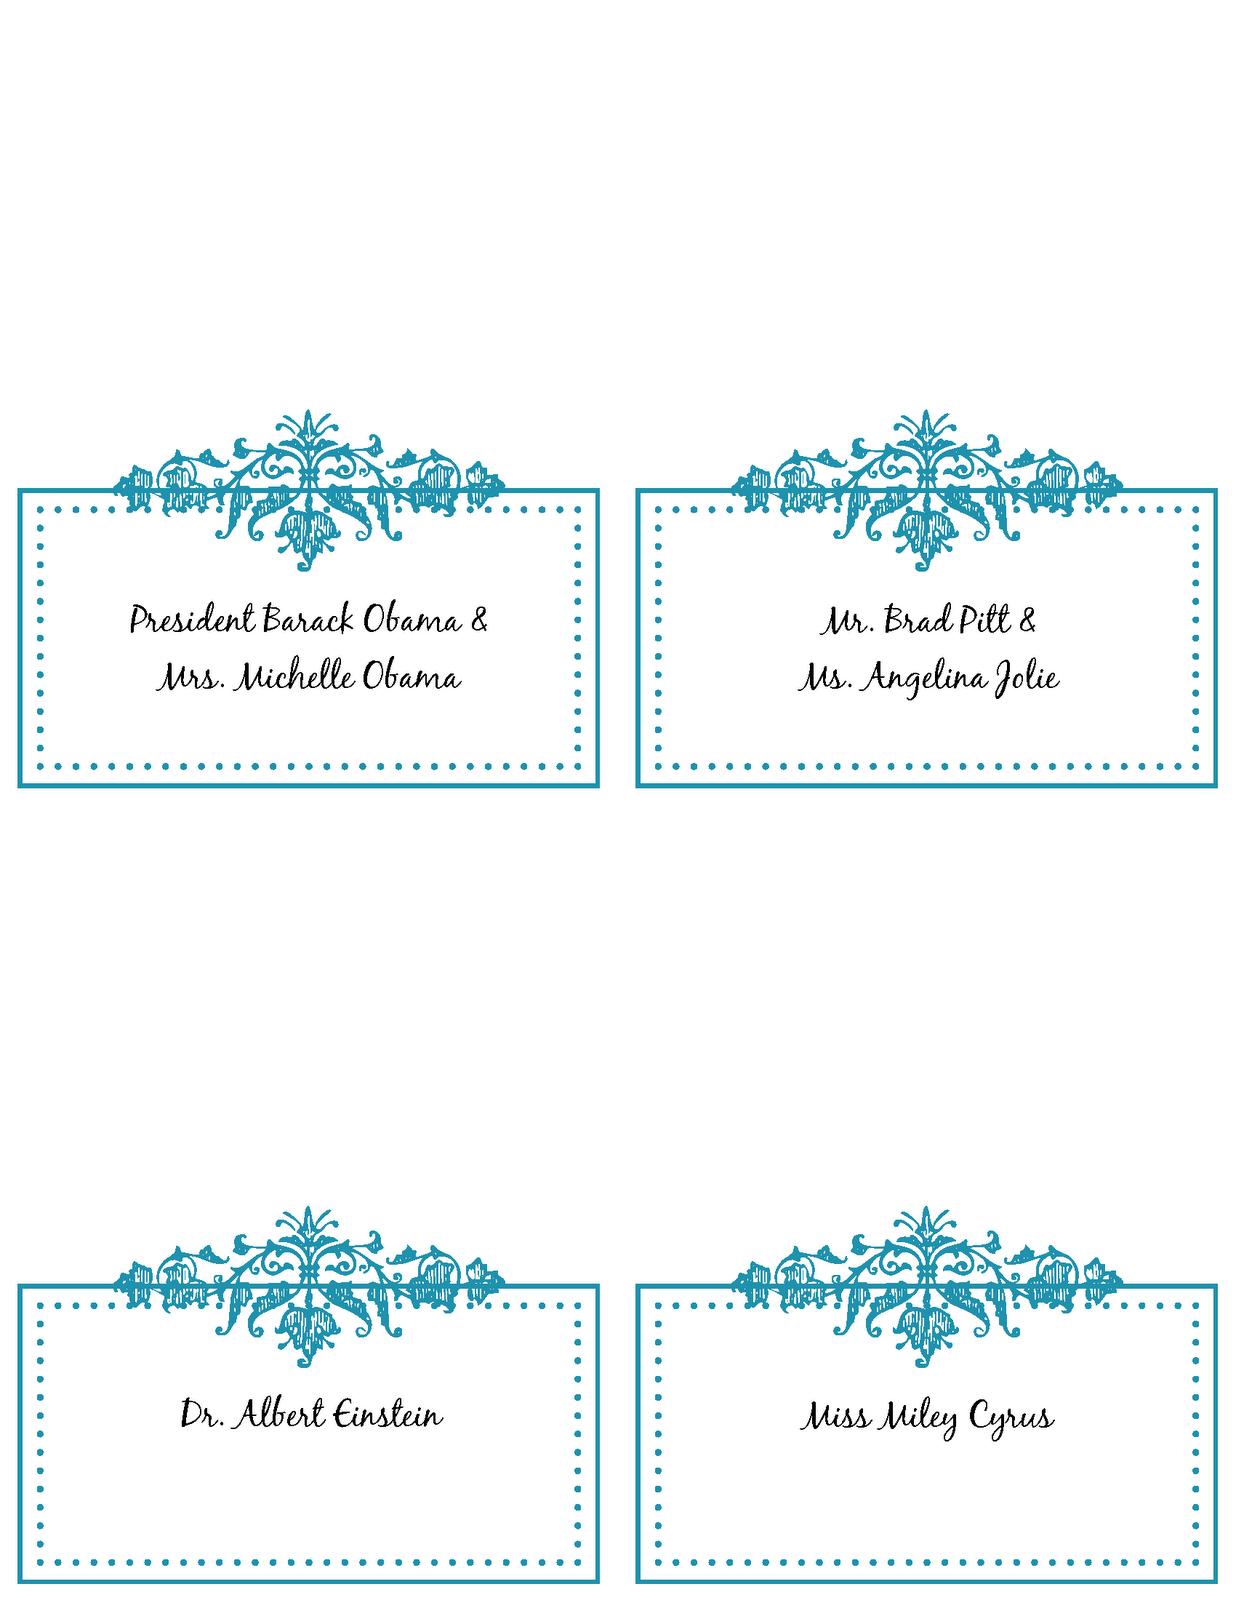 Custom Save Date Cards Online